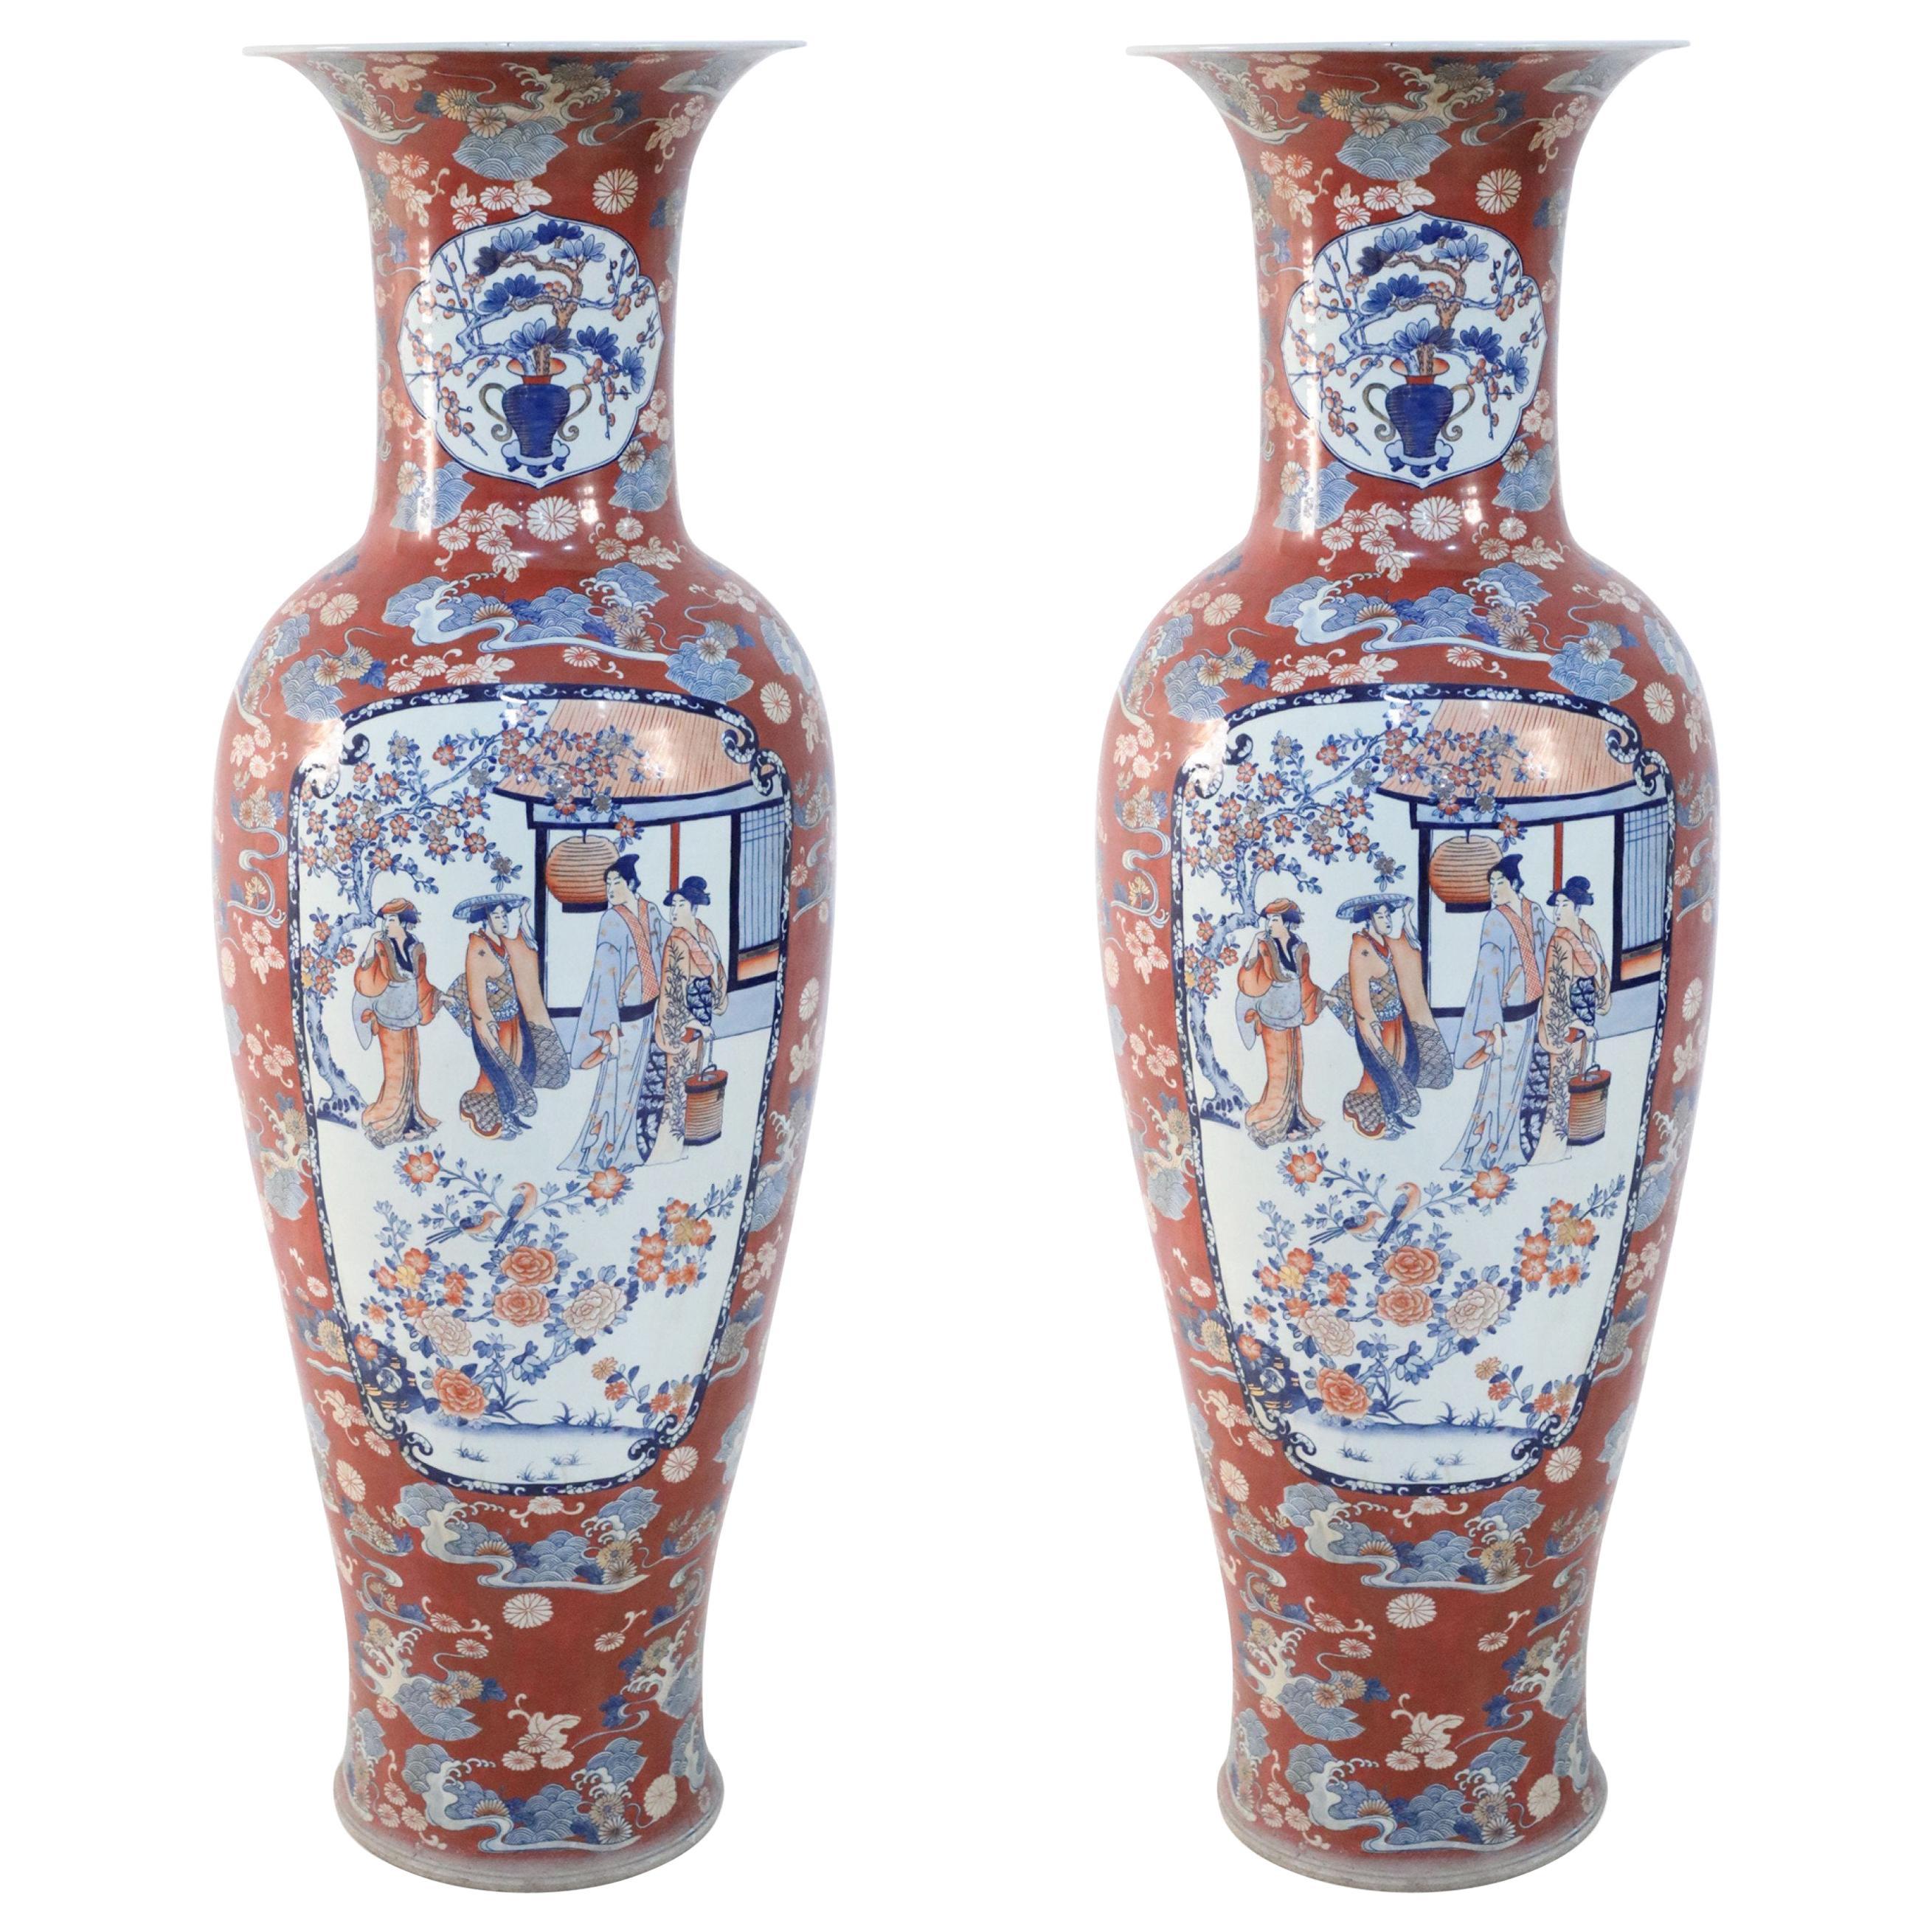 Pair of Chinese Monumental Imari-Style Orange Porcelain Urns